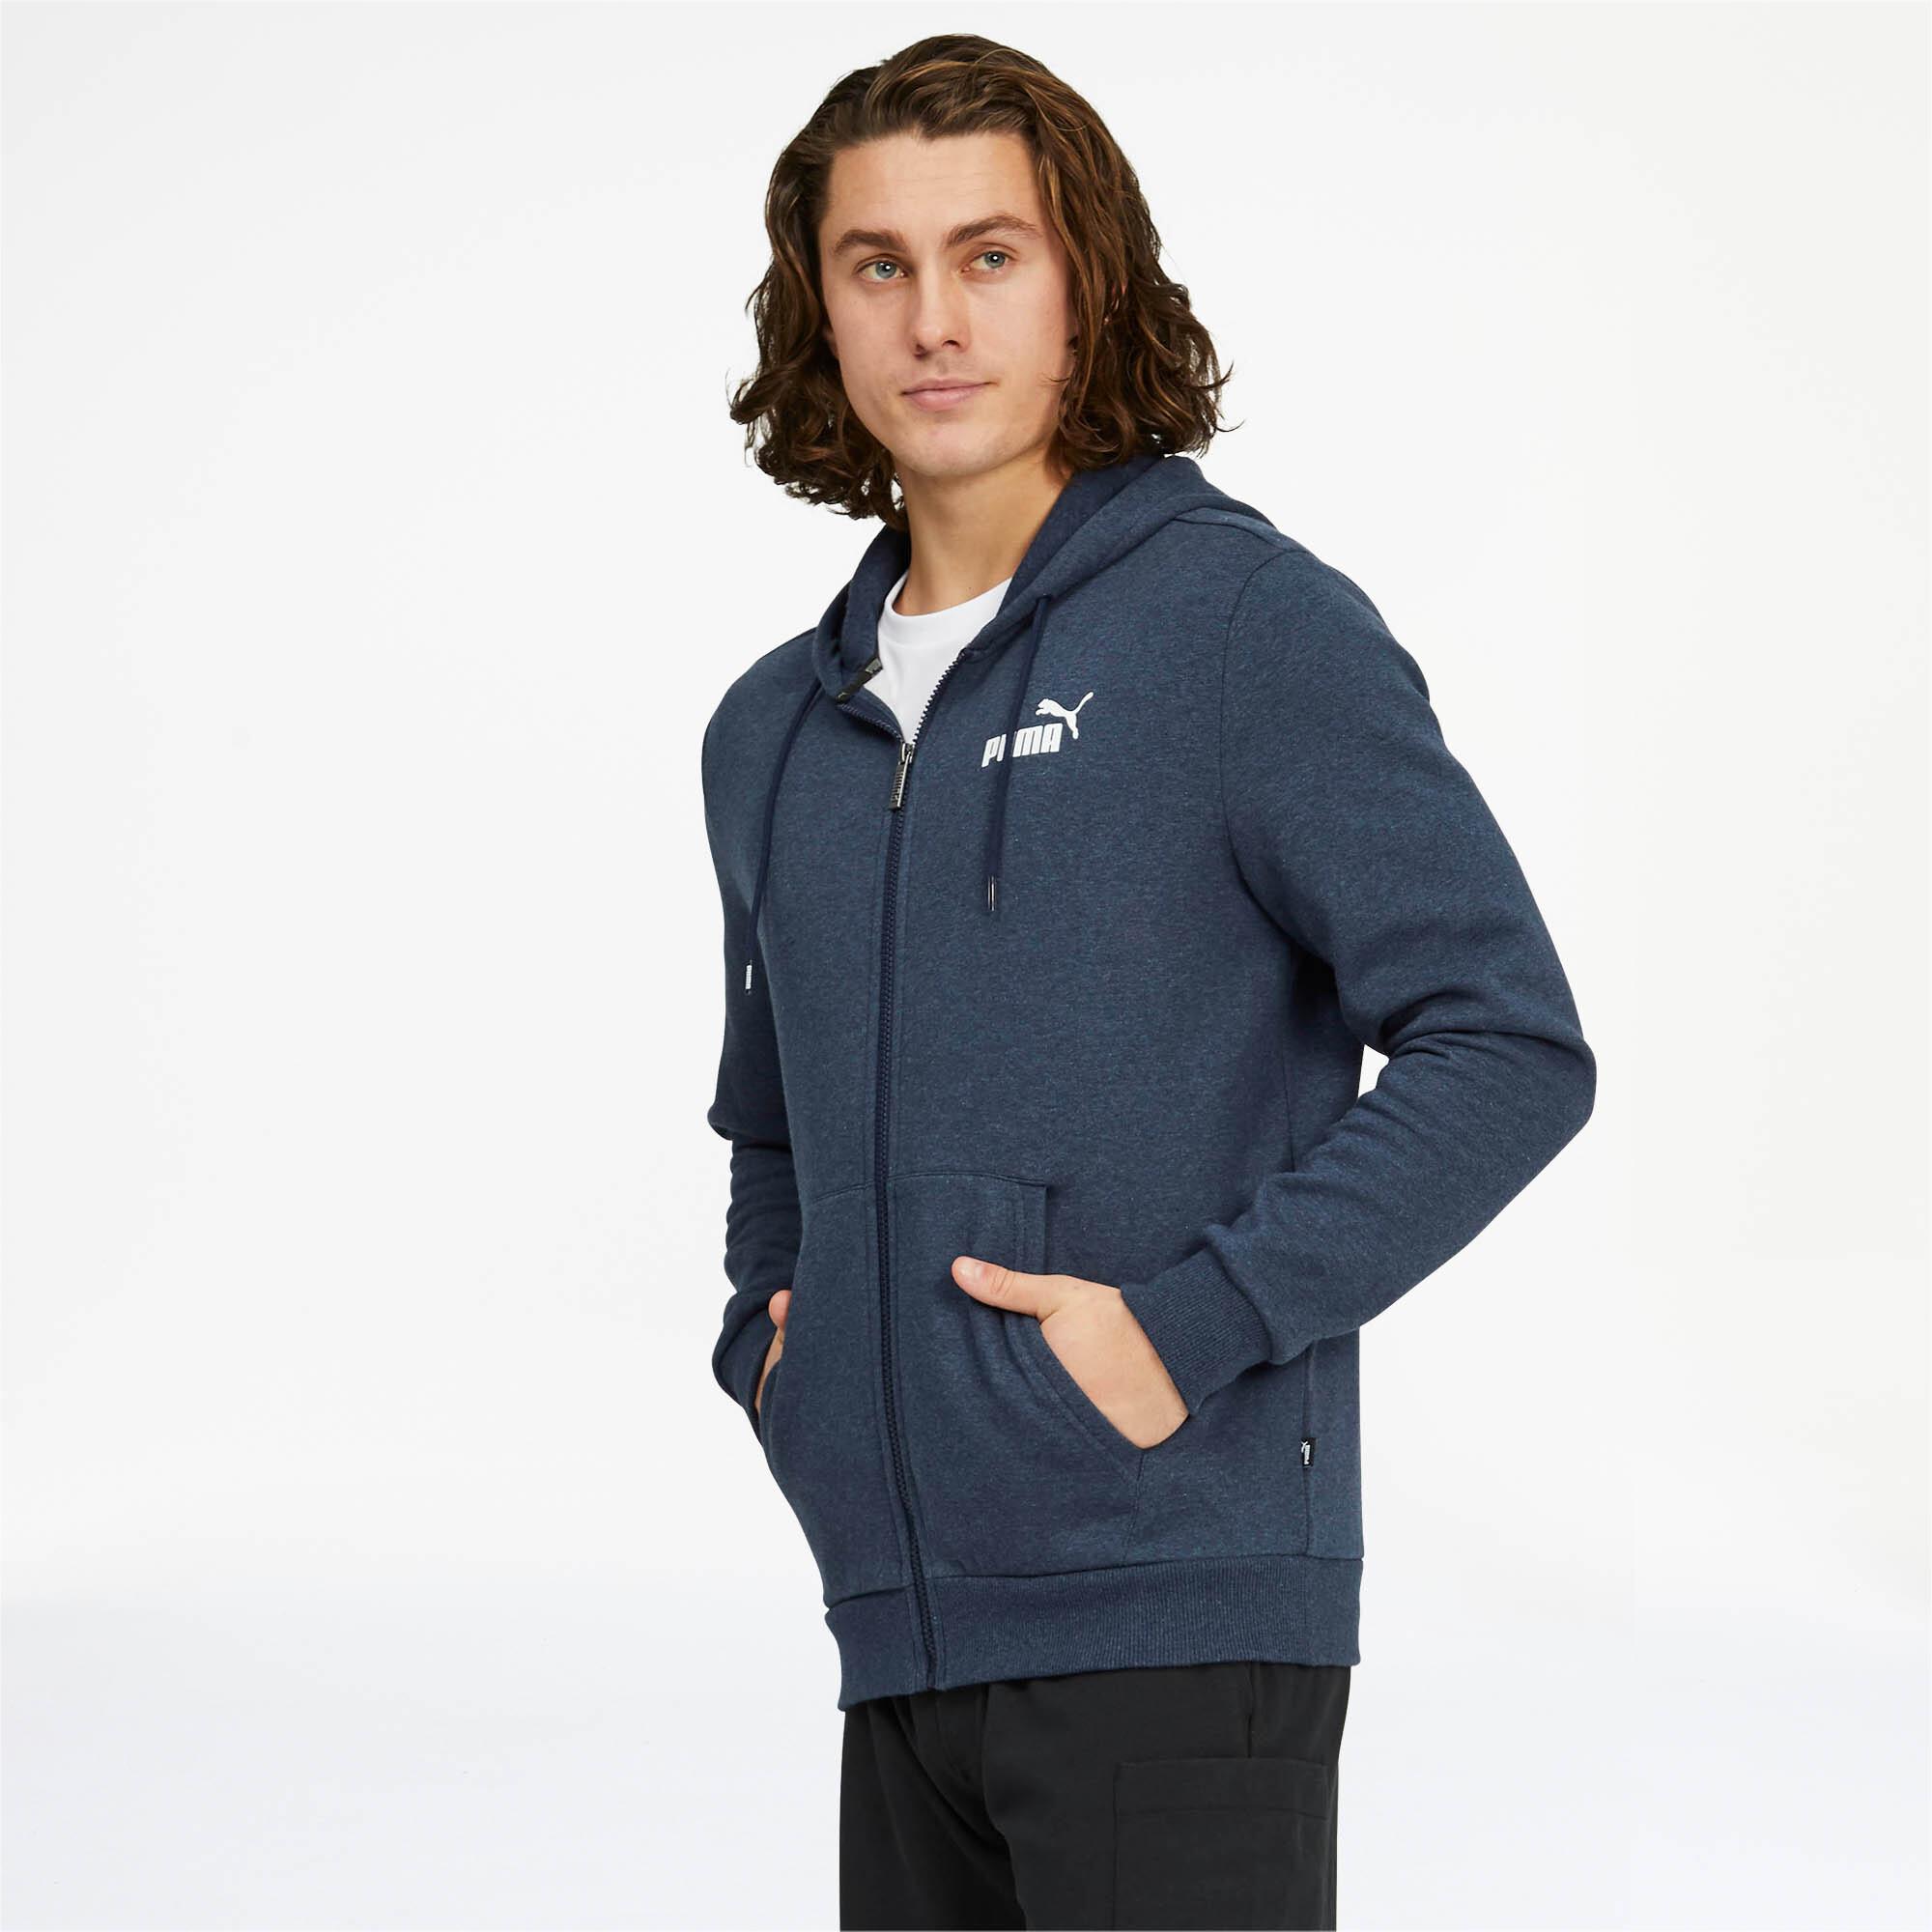 PUMA-Essentials-Men-039-s-Fleece-Hooded-Jacket-Men-Sweat-Basics thumbnail 4